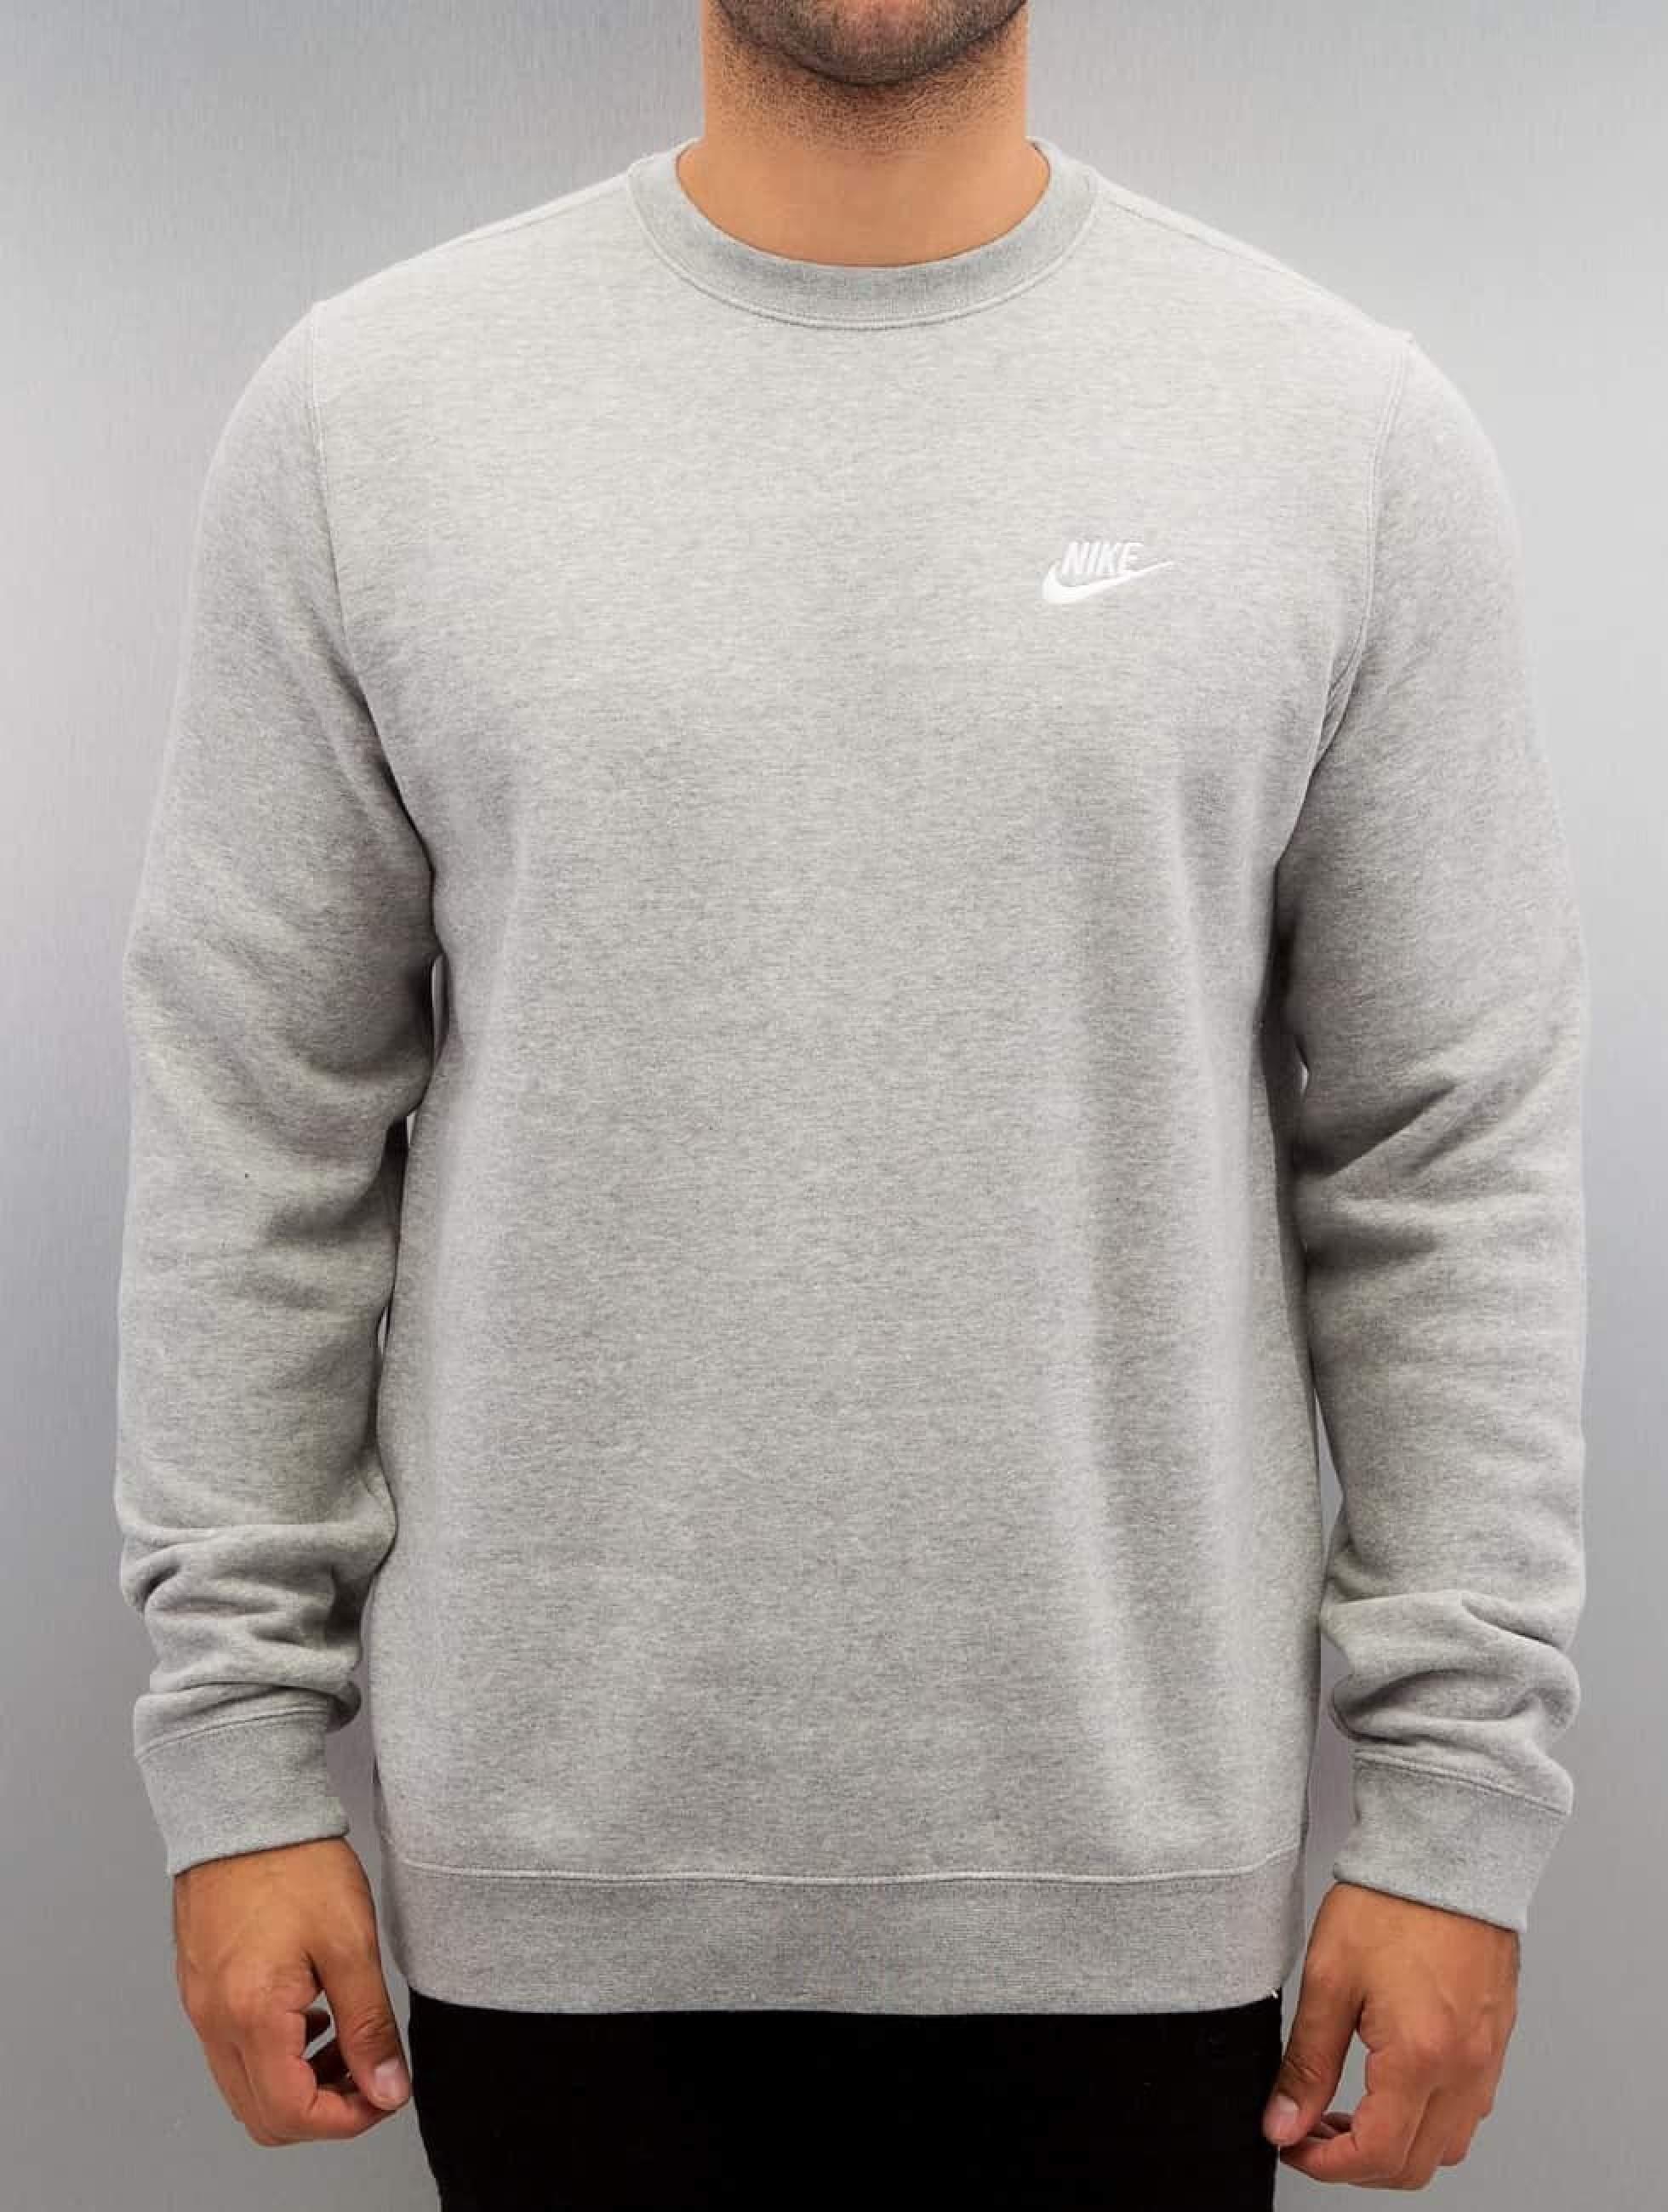 01e3361da3a Nike bovenstuk / trui NSW Fleece Club in grijs 258326